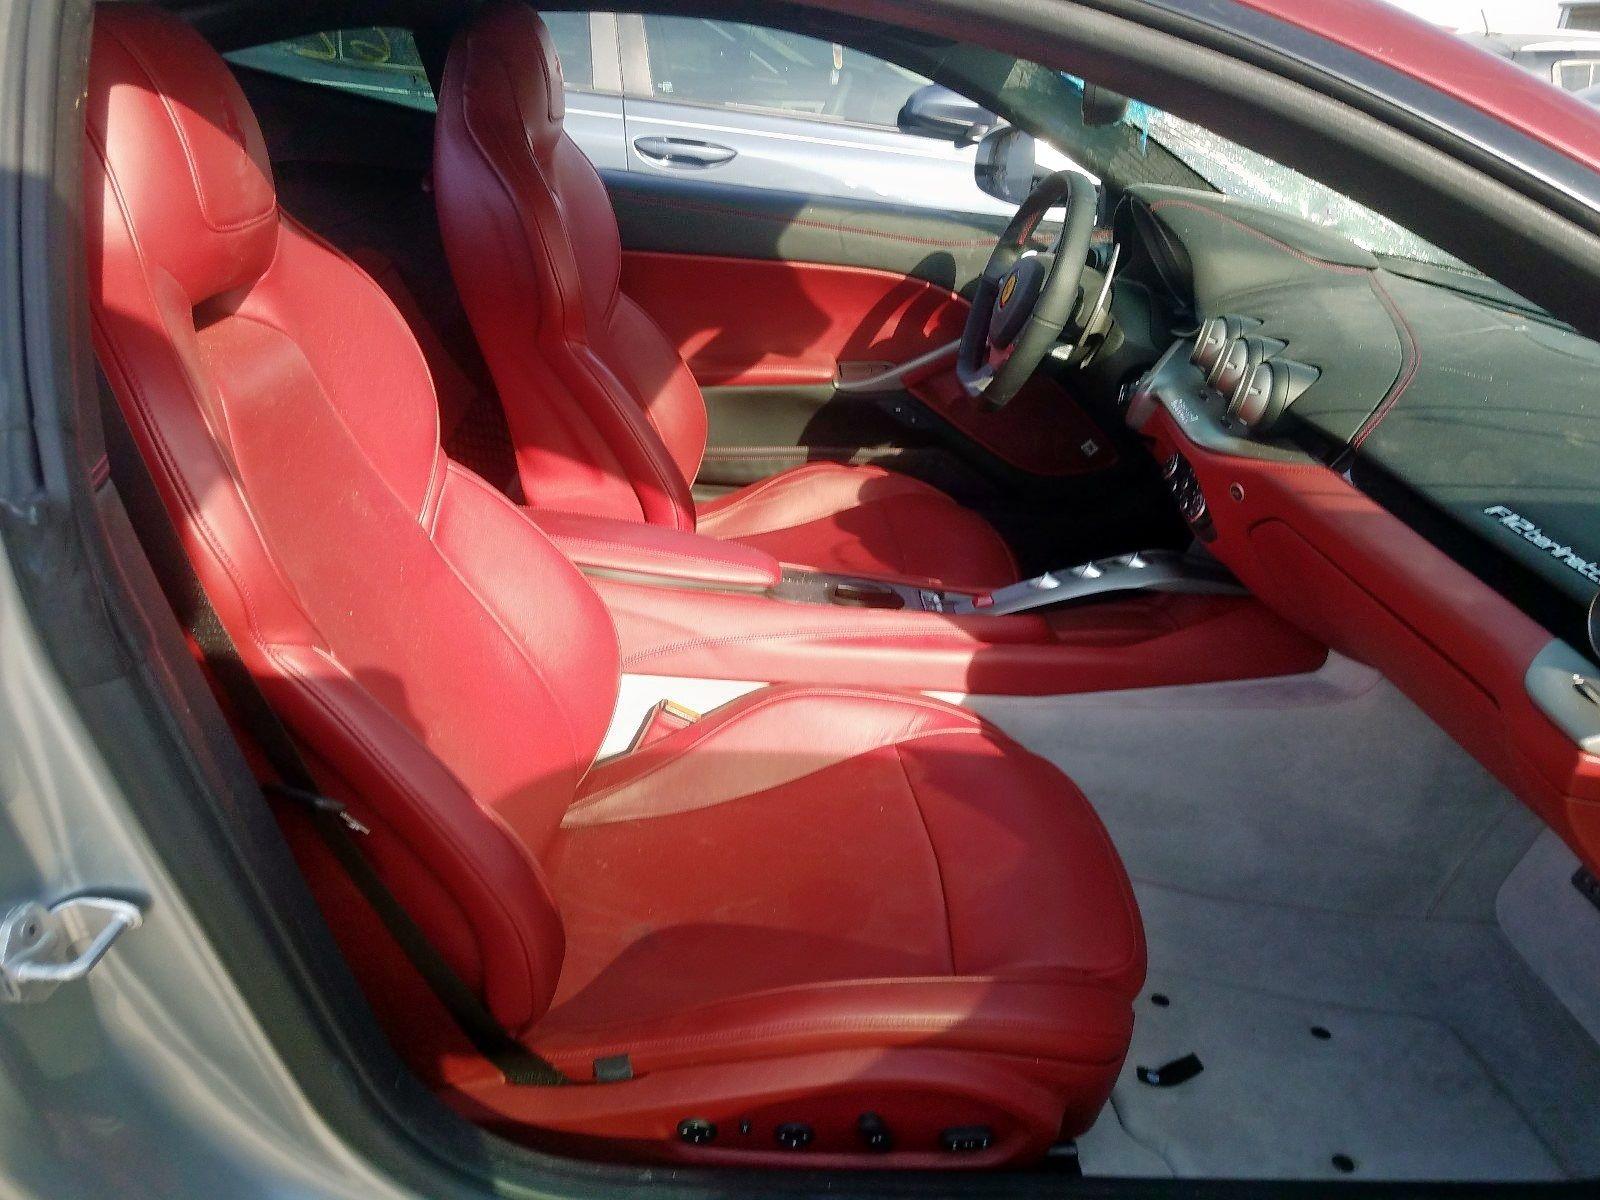 Crashed-Ferrari-F12berlinetta-for-sale-7